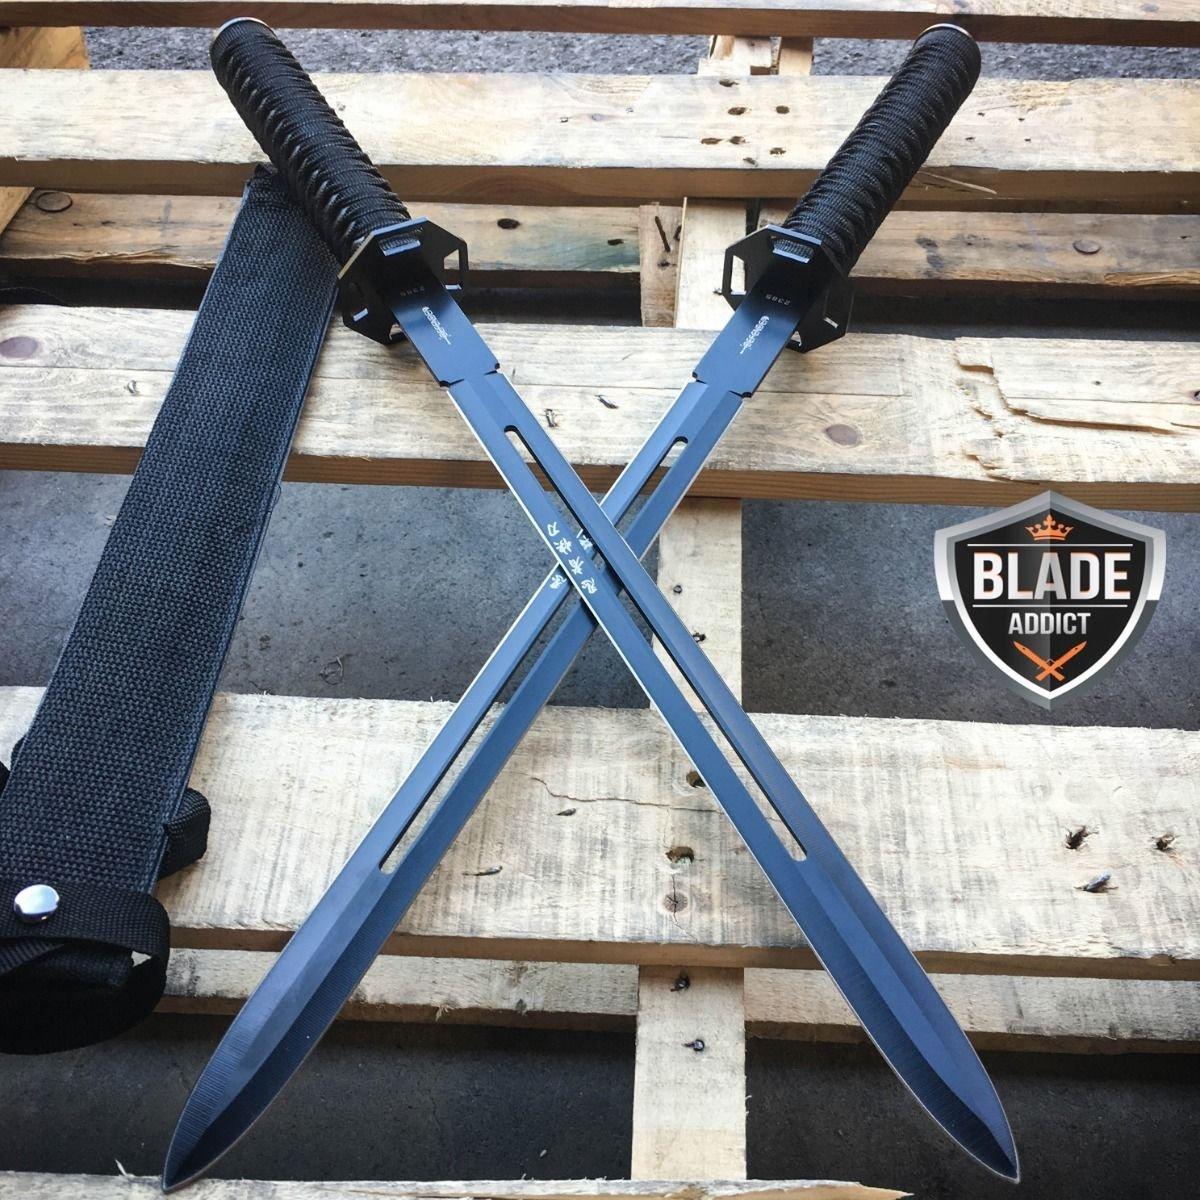 2 PC 23'' NINJA SWORD BLACK DUAL Tactical Machete Blade Katana Throwing EcoGift Nice Knife with Sharp Blade NEW- Great For Fun And Practical Use